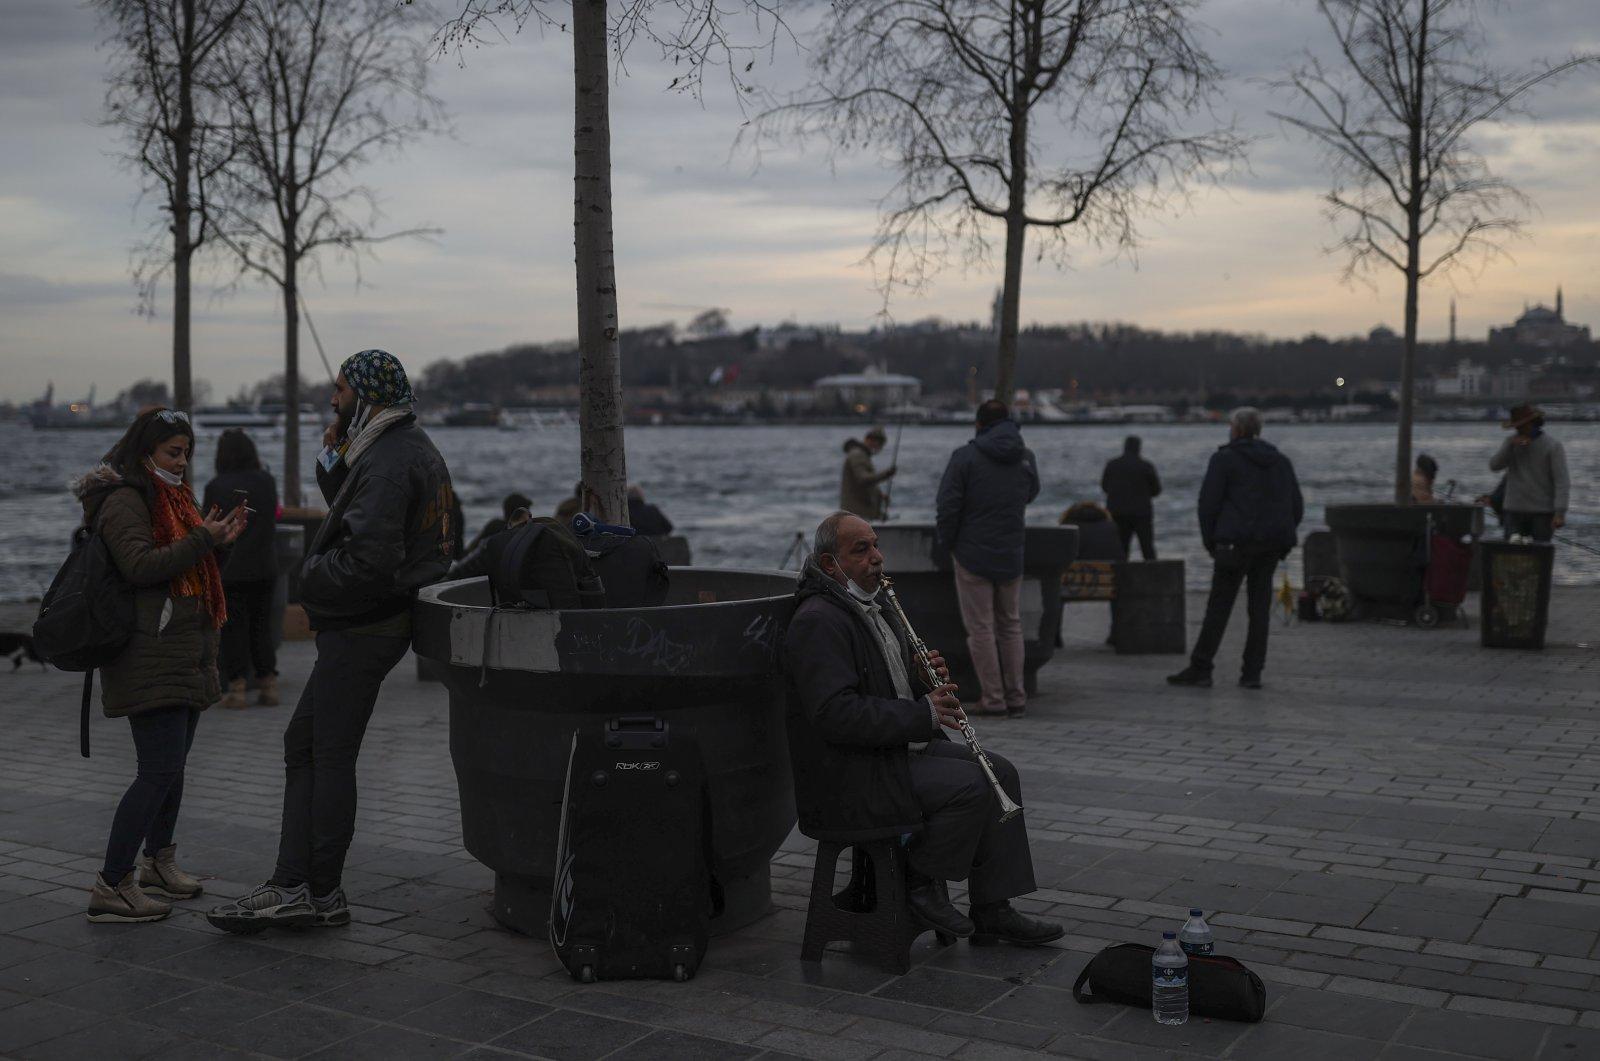 A musician performs while people promenade at the seaside of Karaköy, Beyoğlu, Istanbul, Turkey, Jan. 22, 2021. (AP Photo)